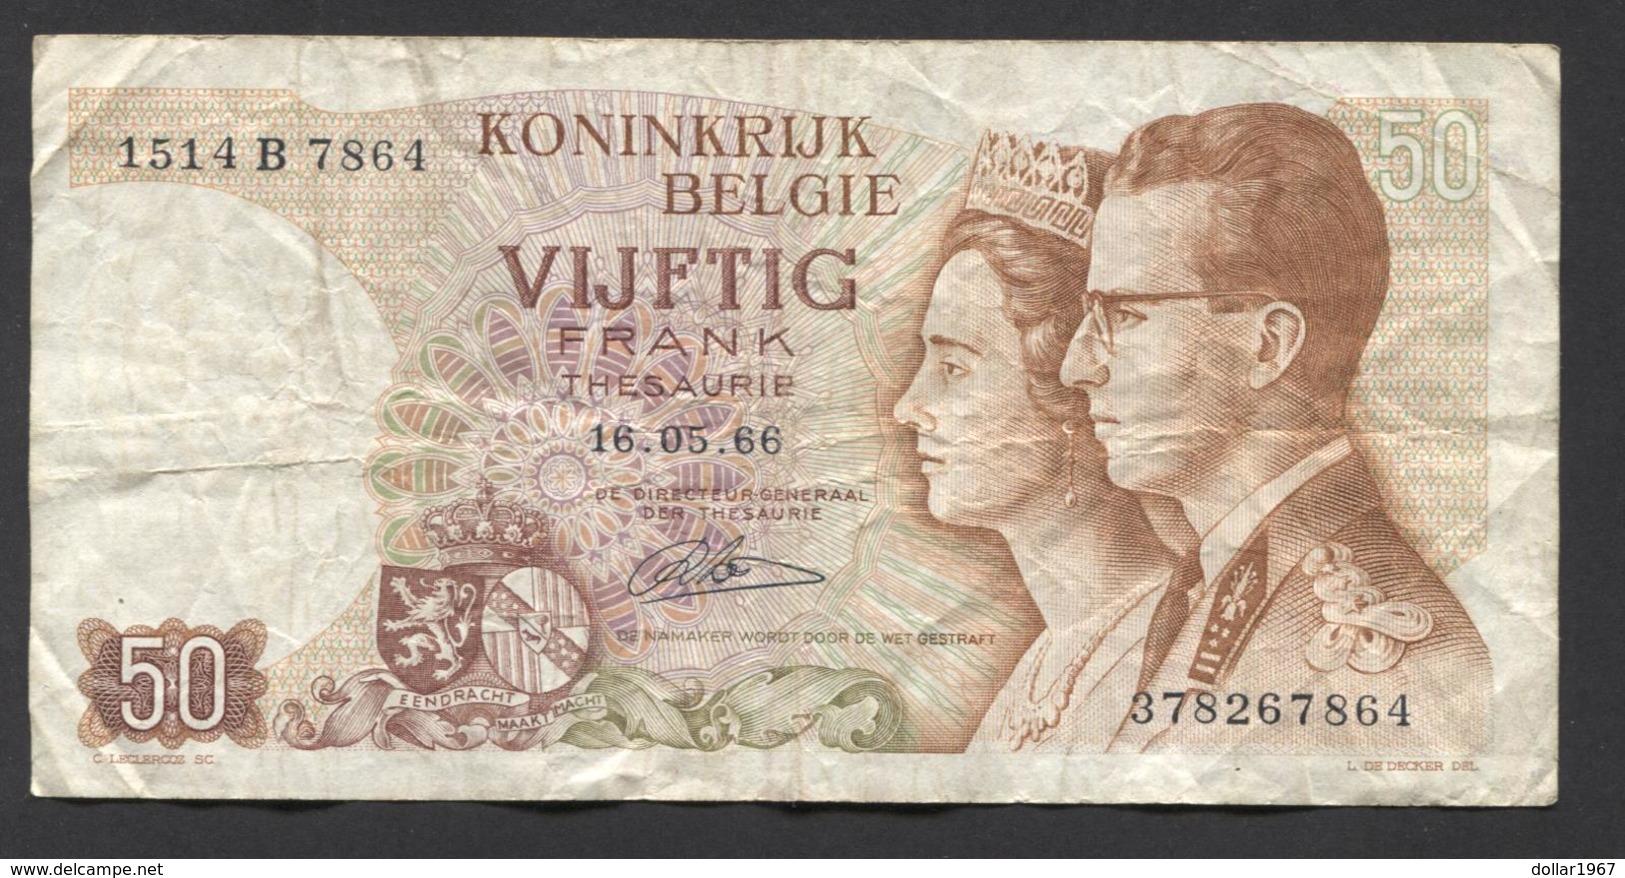 België 50 Frank 14-5- 1966 -NO: 1514 B 7864 - [ 6] Treasury